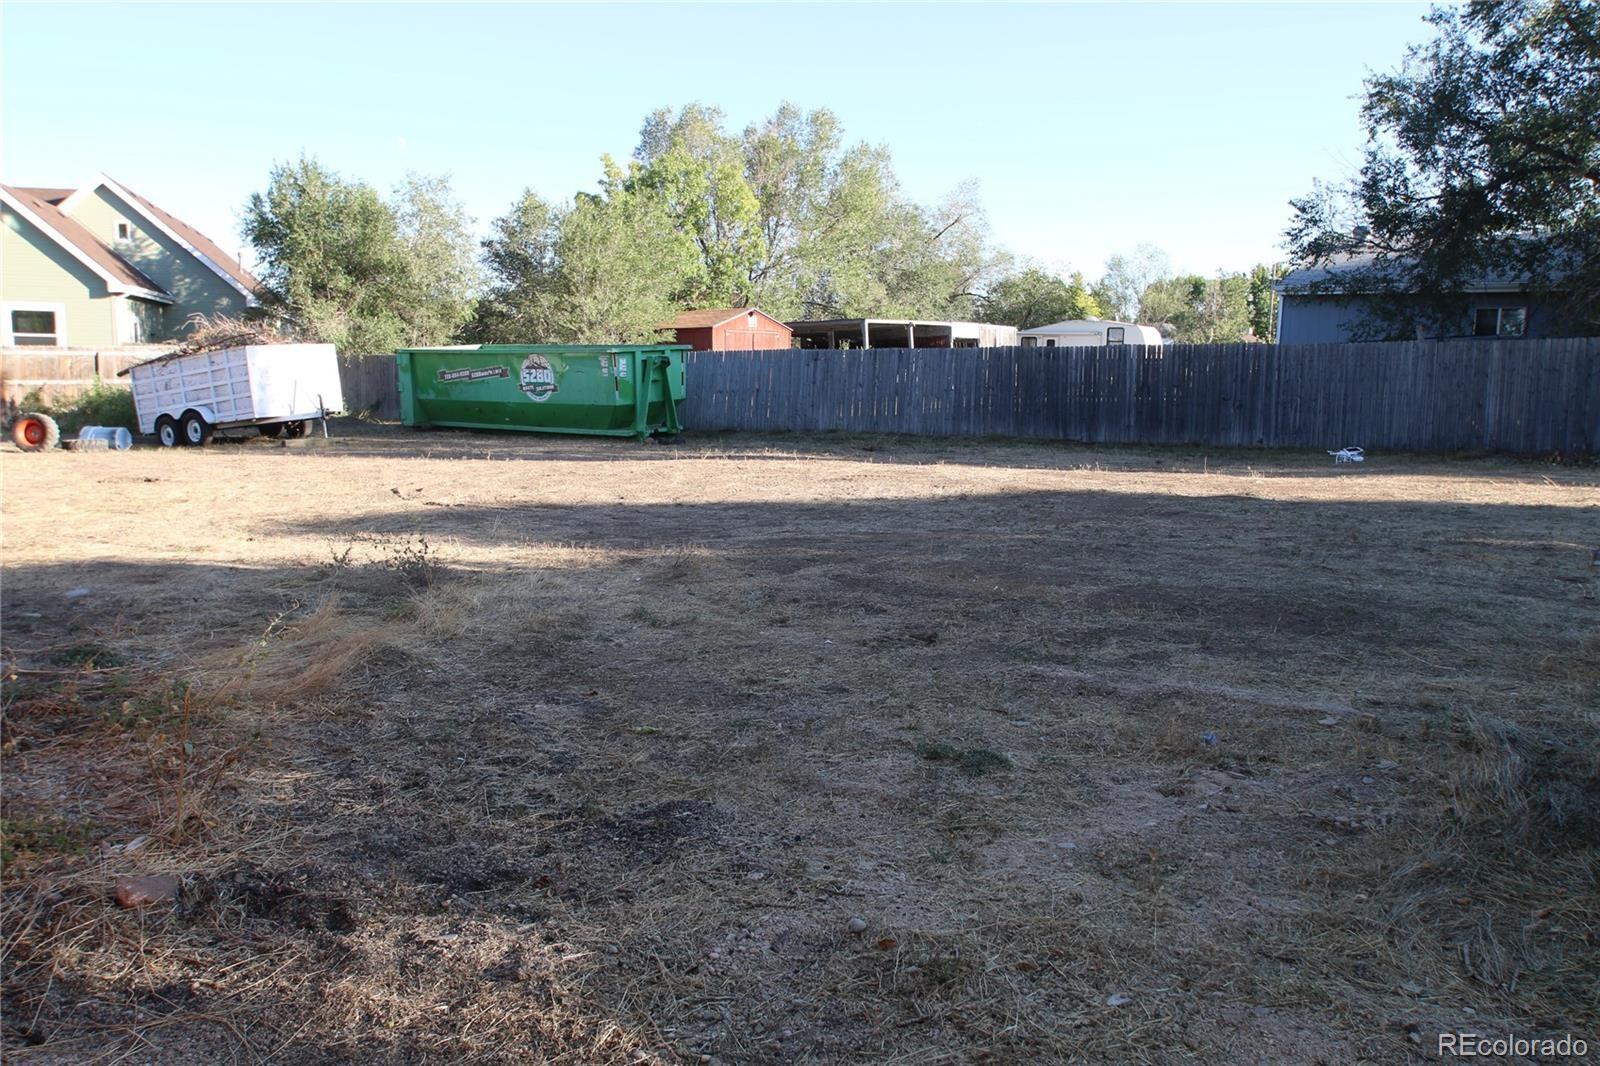 MLS# 8734408 - 2 - 2830 S Decatur Street, Denver, CO 80236